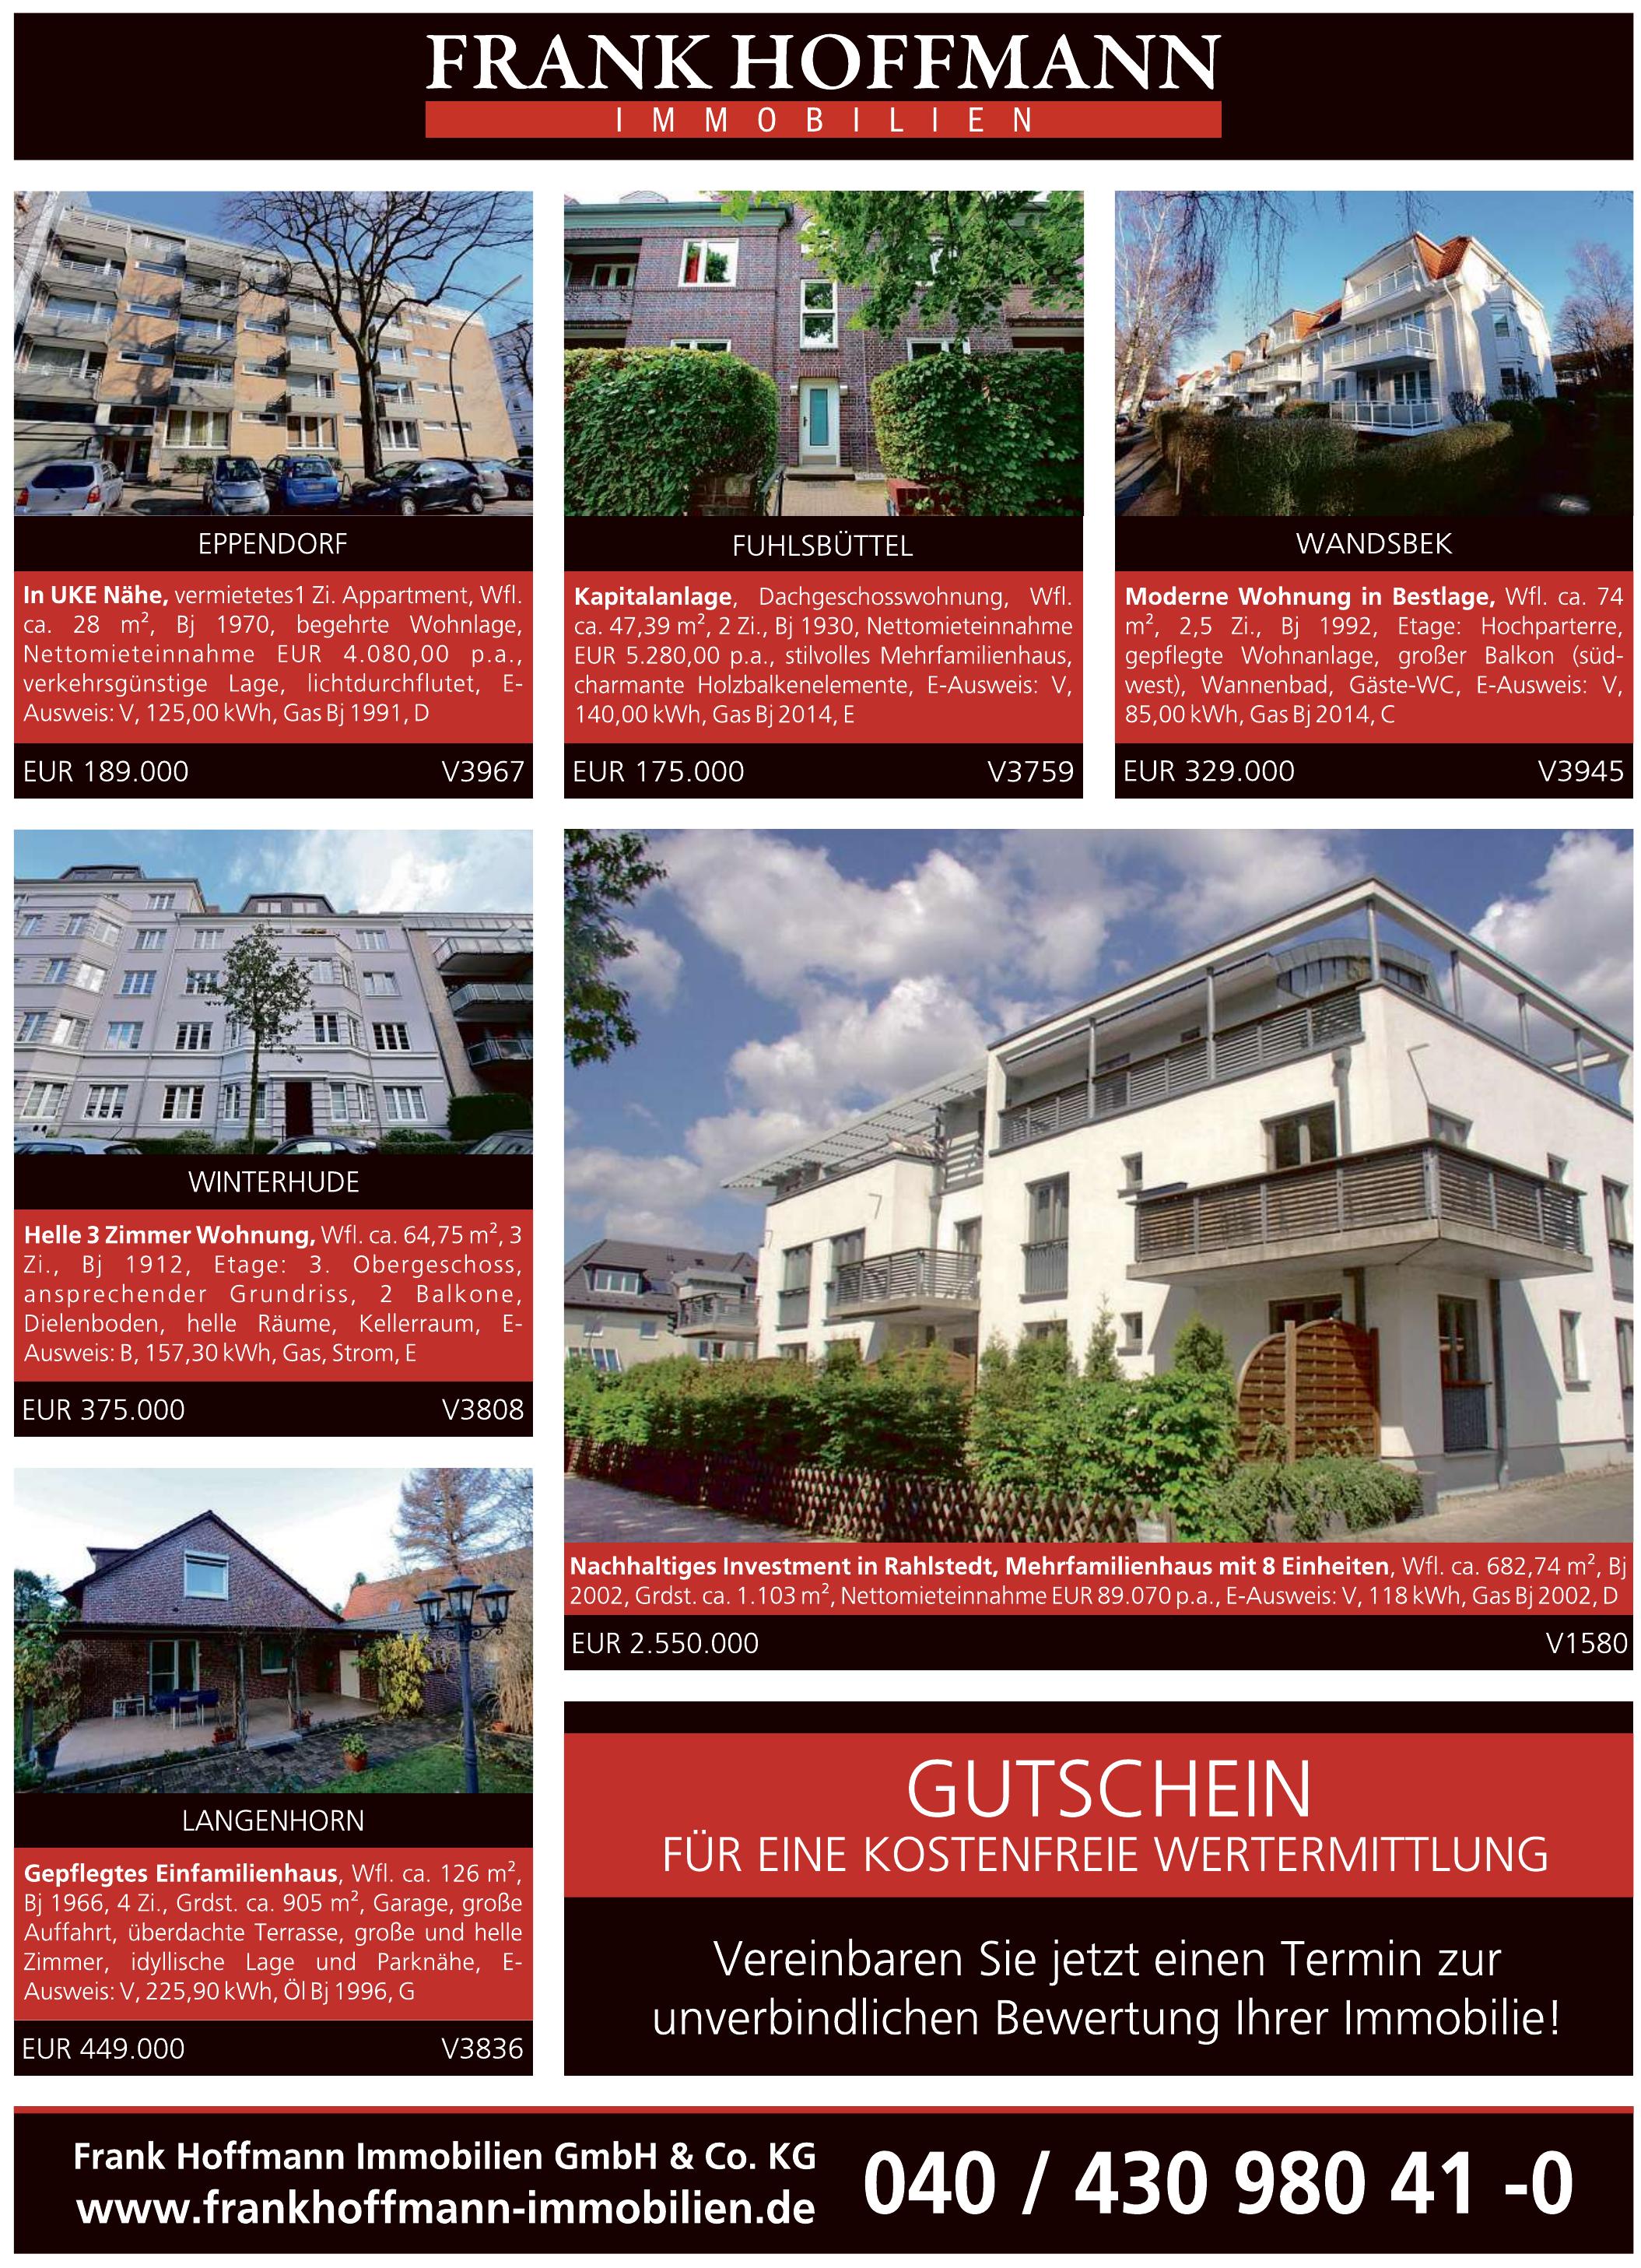 Frank Hoffmann Immobilien GmbH & Co. KG